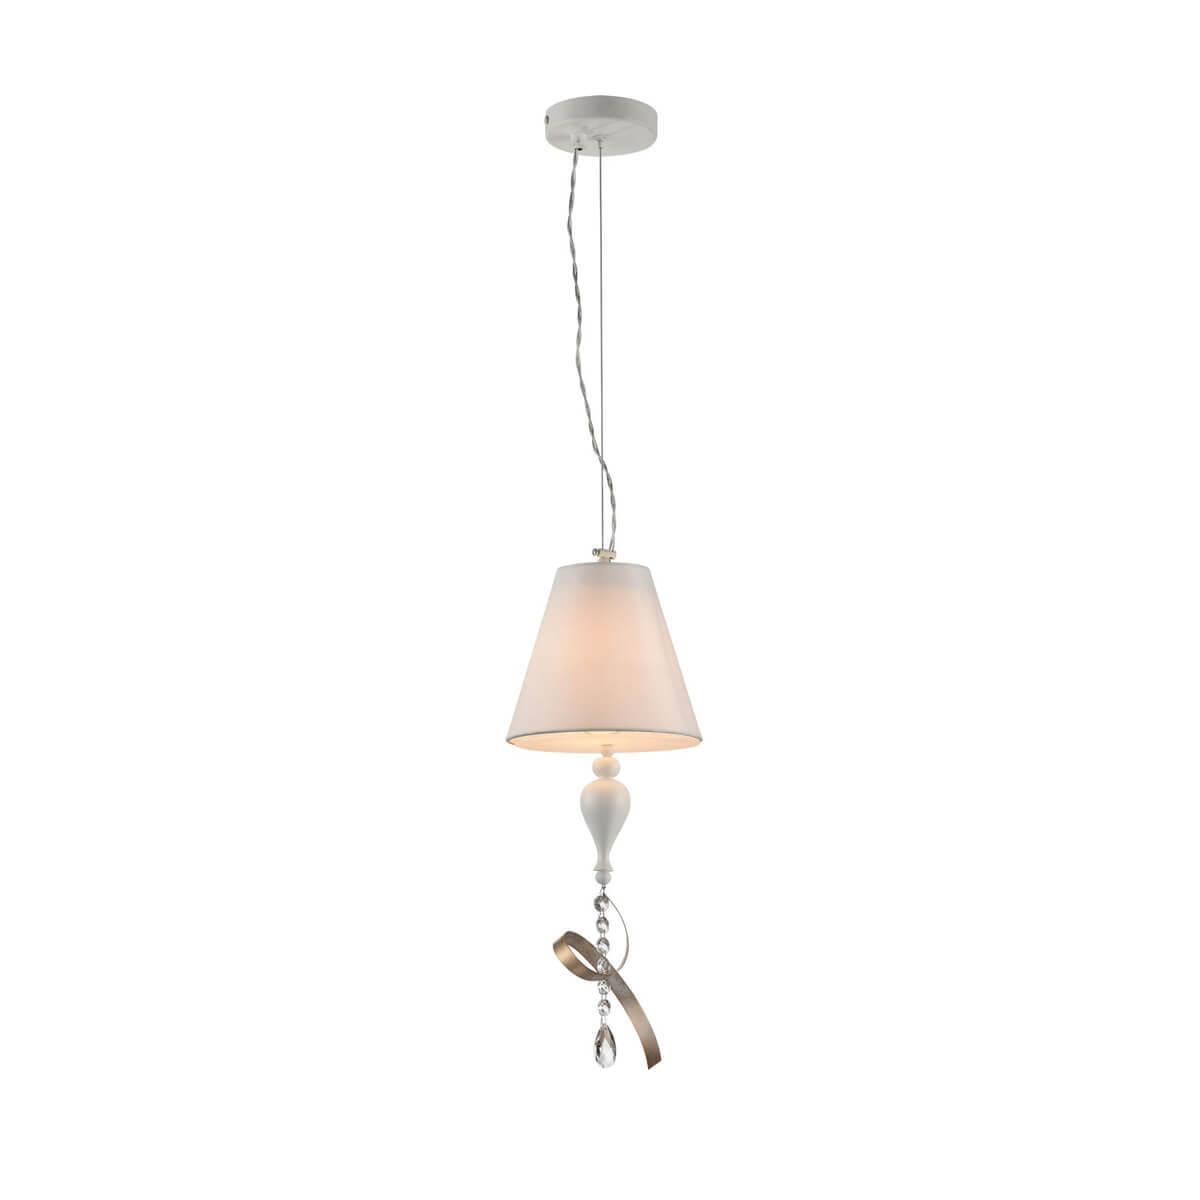 Светильник Maytoni ARM010-22-W Intreccio maytoni настольная лампа maytoni intreccio arm010 11 r